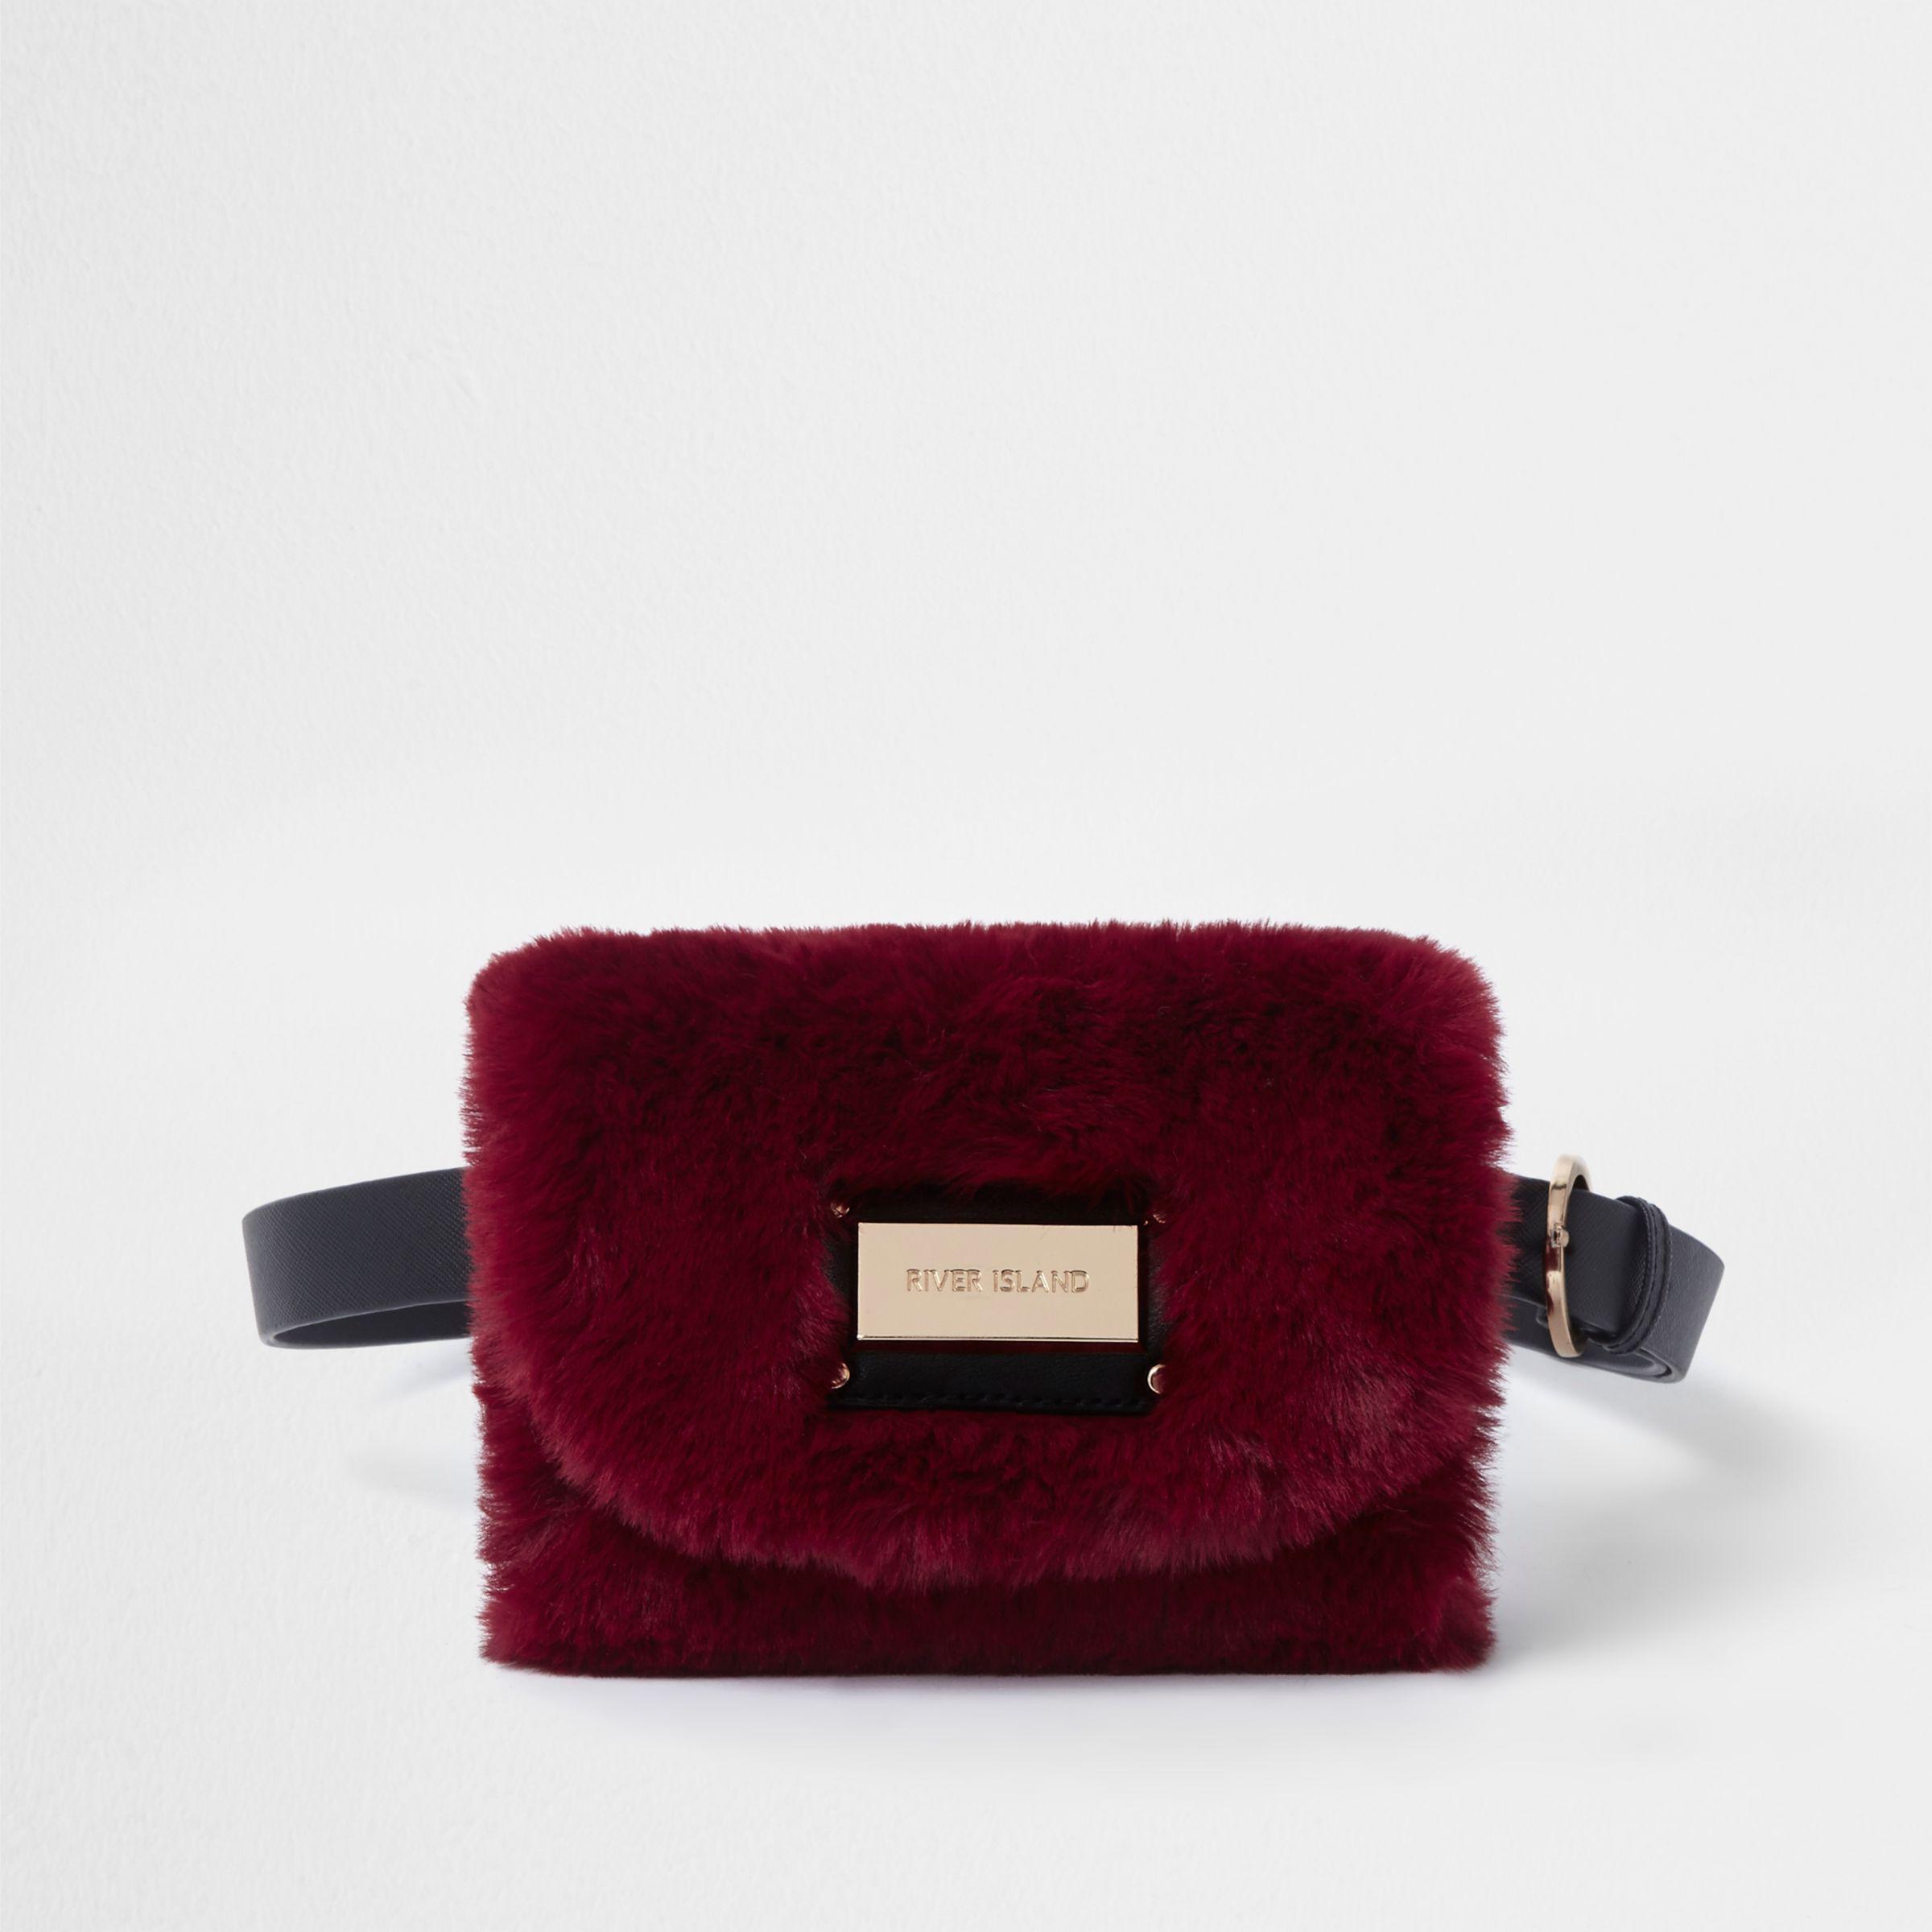 River Island Dark Red Faux Fur Buckle Belt Bum Bag in Red - Lyst 869cd1ae634c0